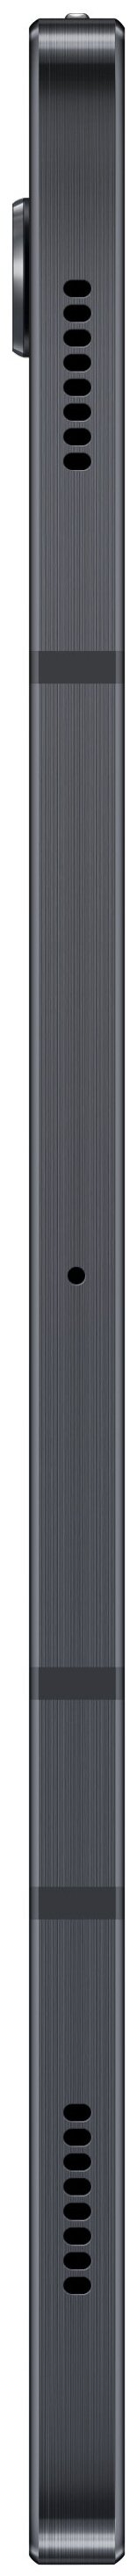 Samsung Galaxy Tab S7 11 SM-T875 128Gb (2020) - процессор: Qualcomm Snapdragon 865+